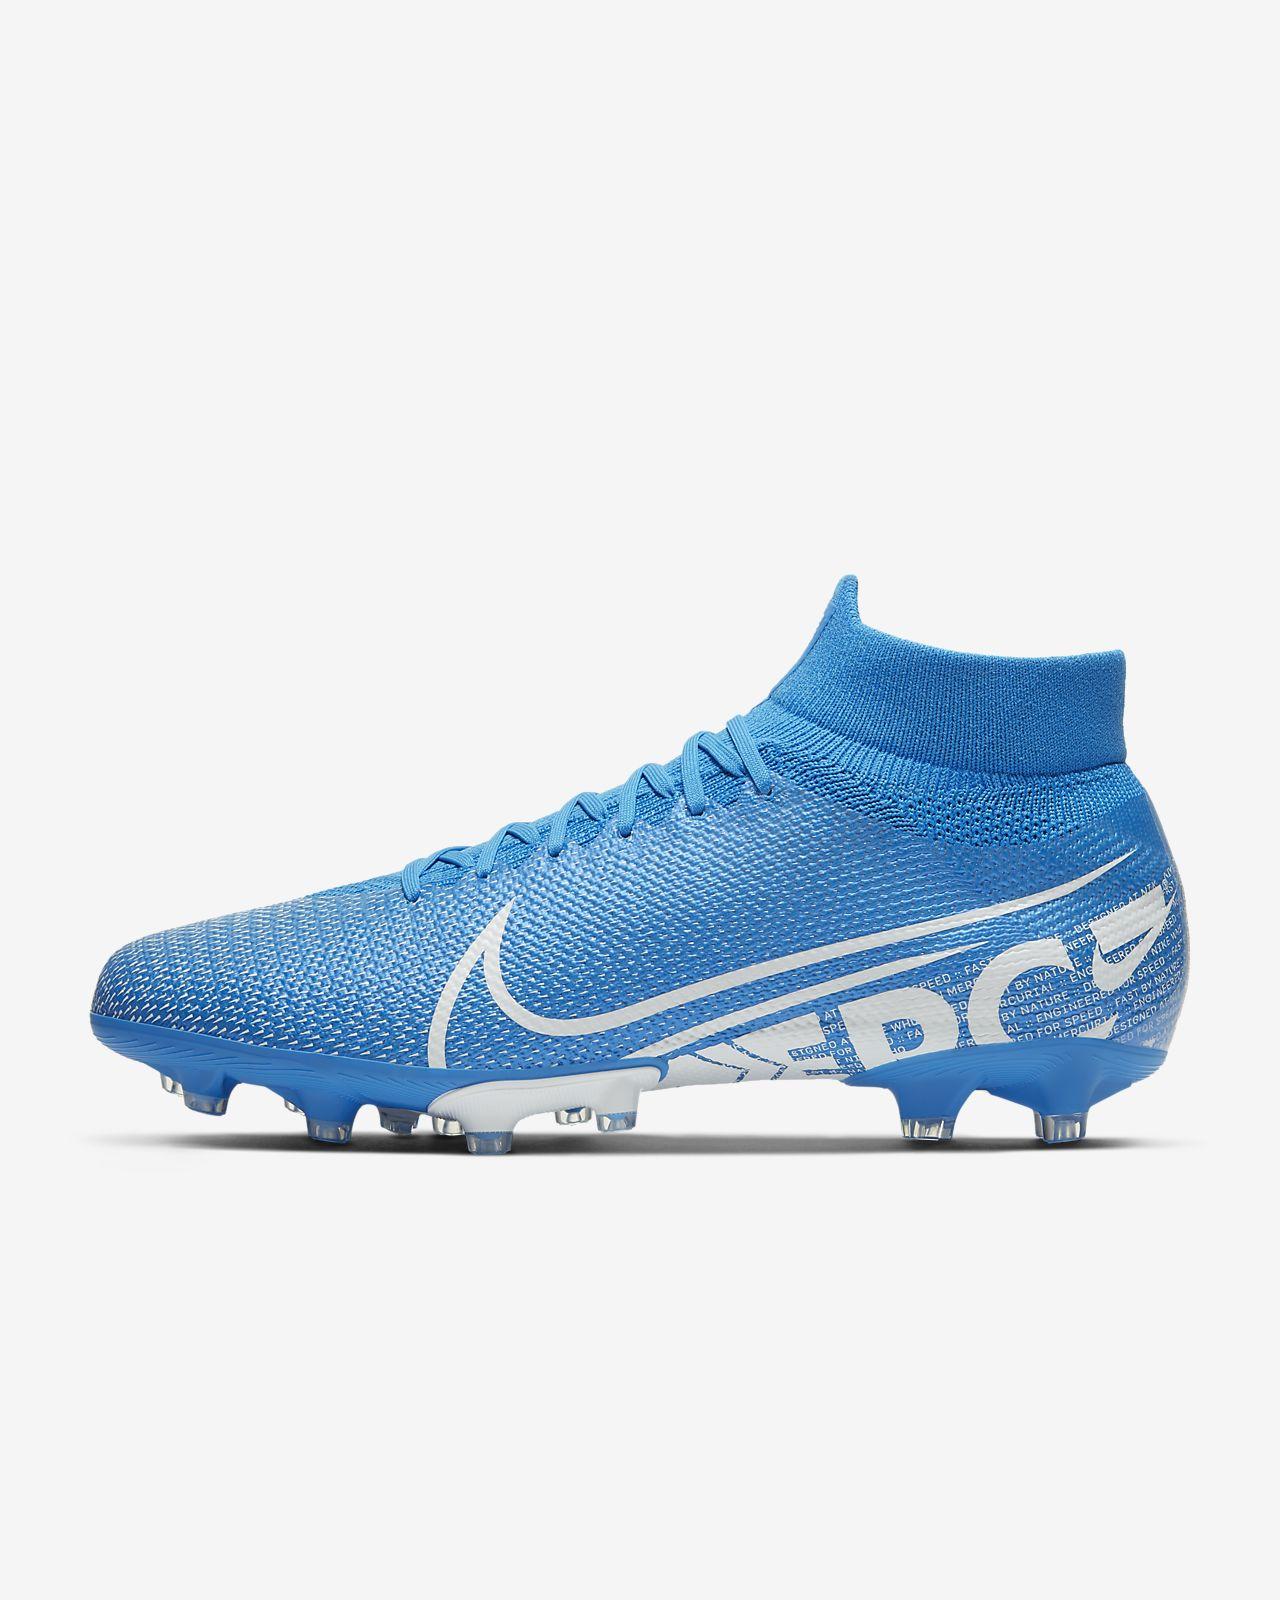 Calzado de fútbol para césped artificial Nike Mercurial Superfly 7 Pro AG-PRO